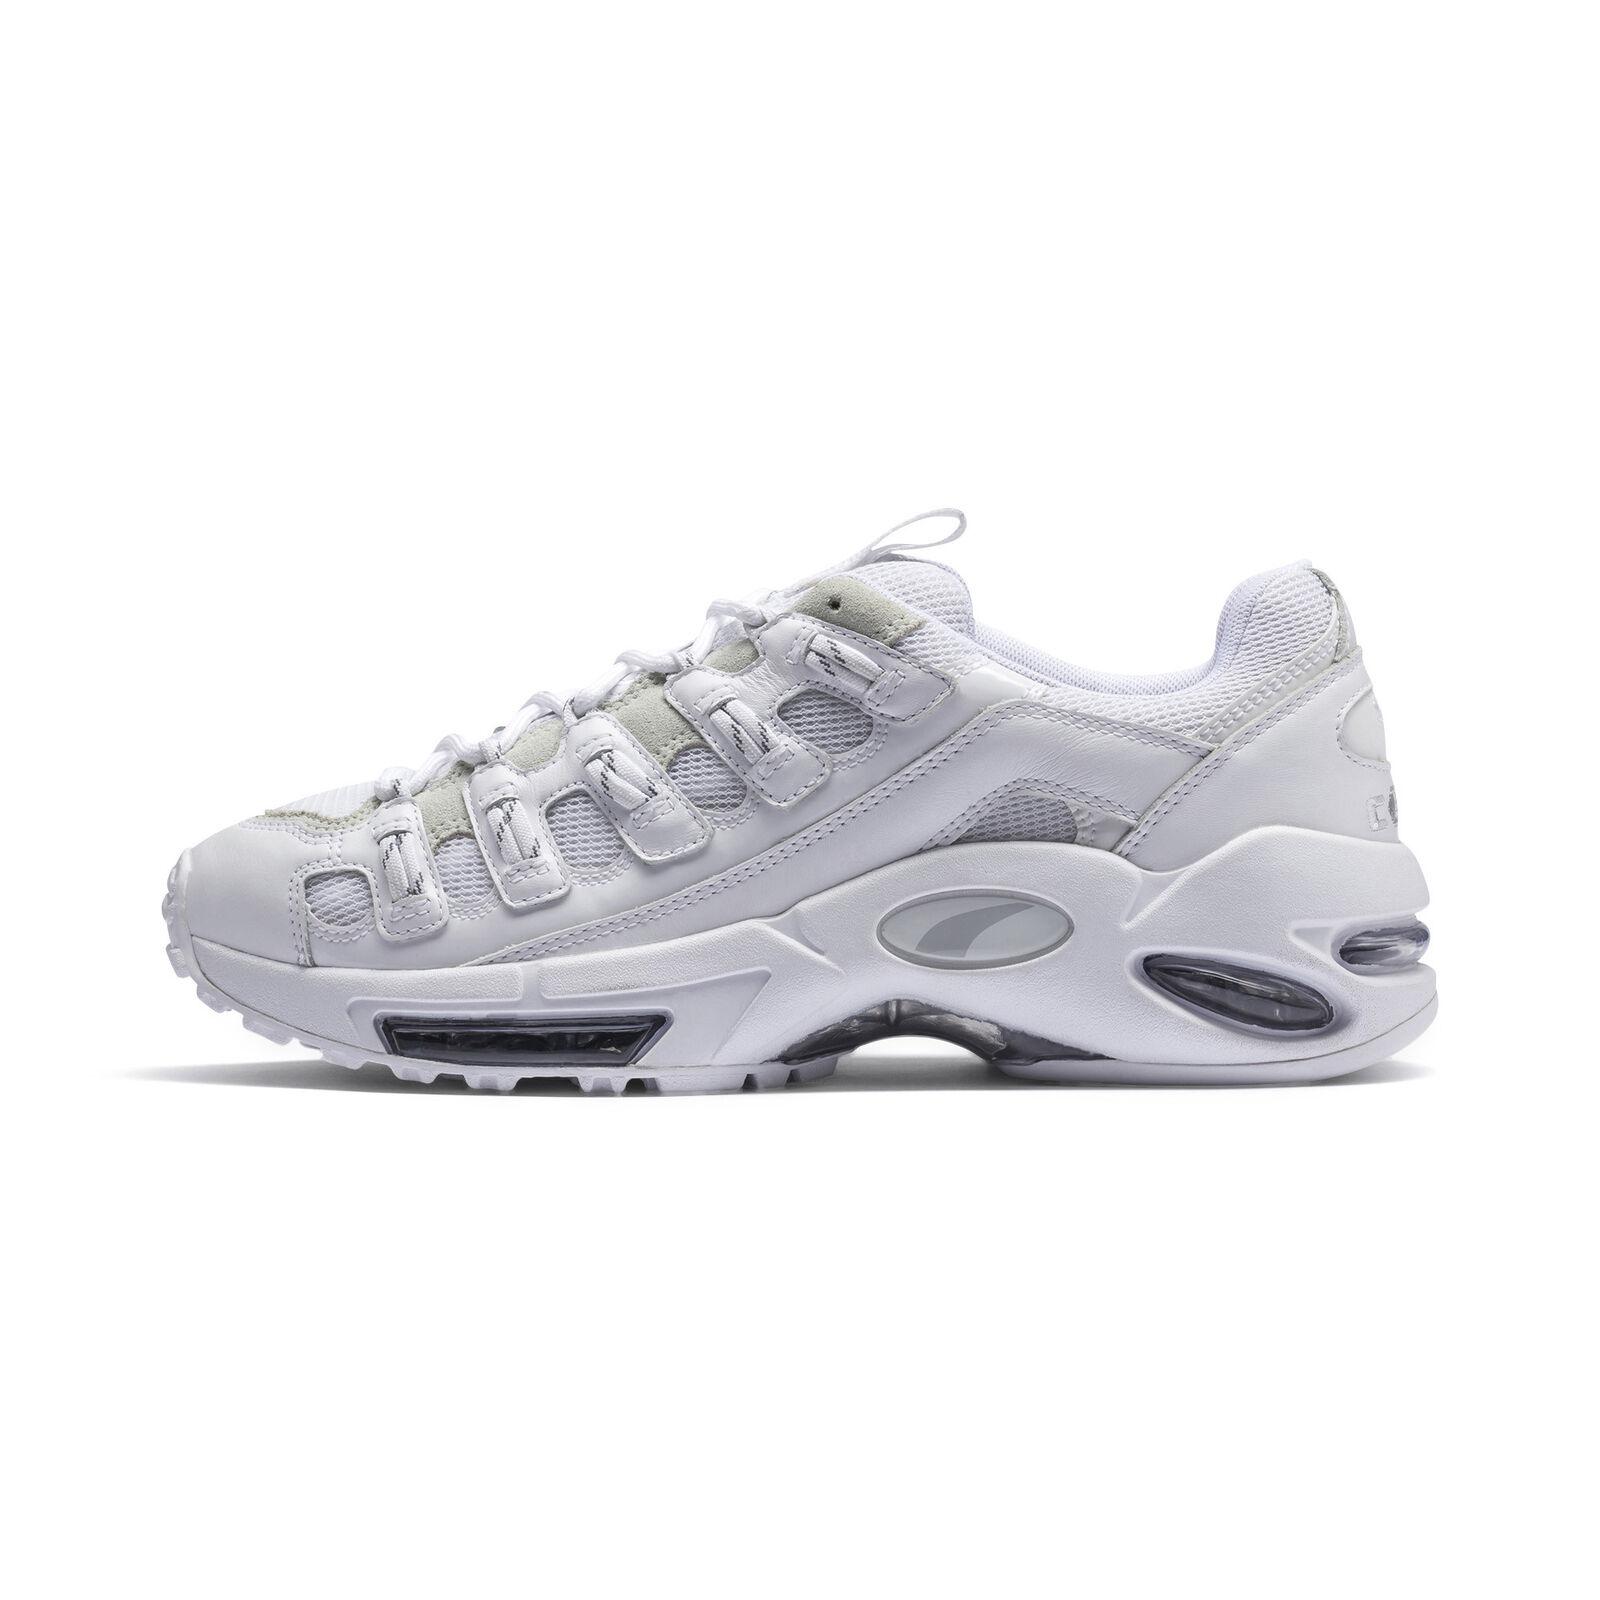 PUMA CELL ENDURA REFLECTIVE blanco Baskets Femme 2019 blanco zapatillas zapatillas zapatillas 369665-02  disfrutando de sus compras